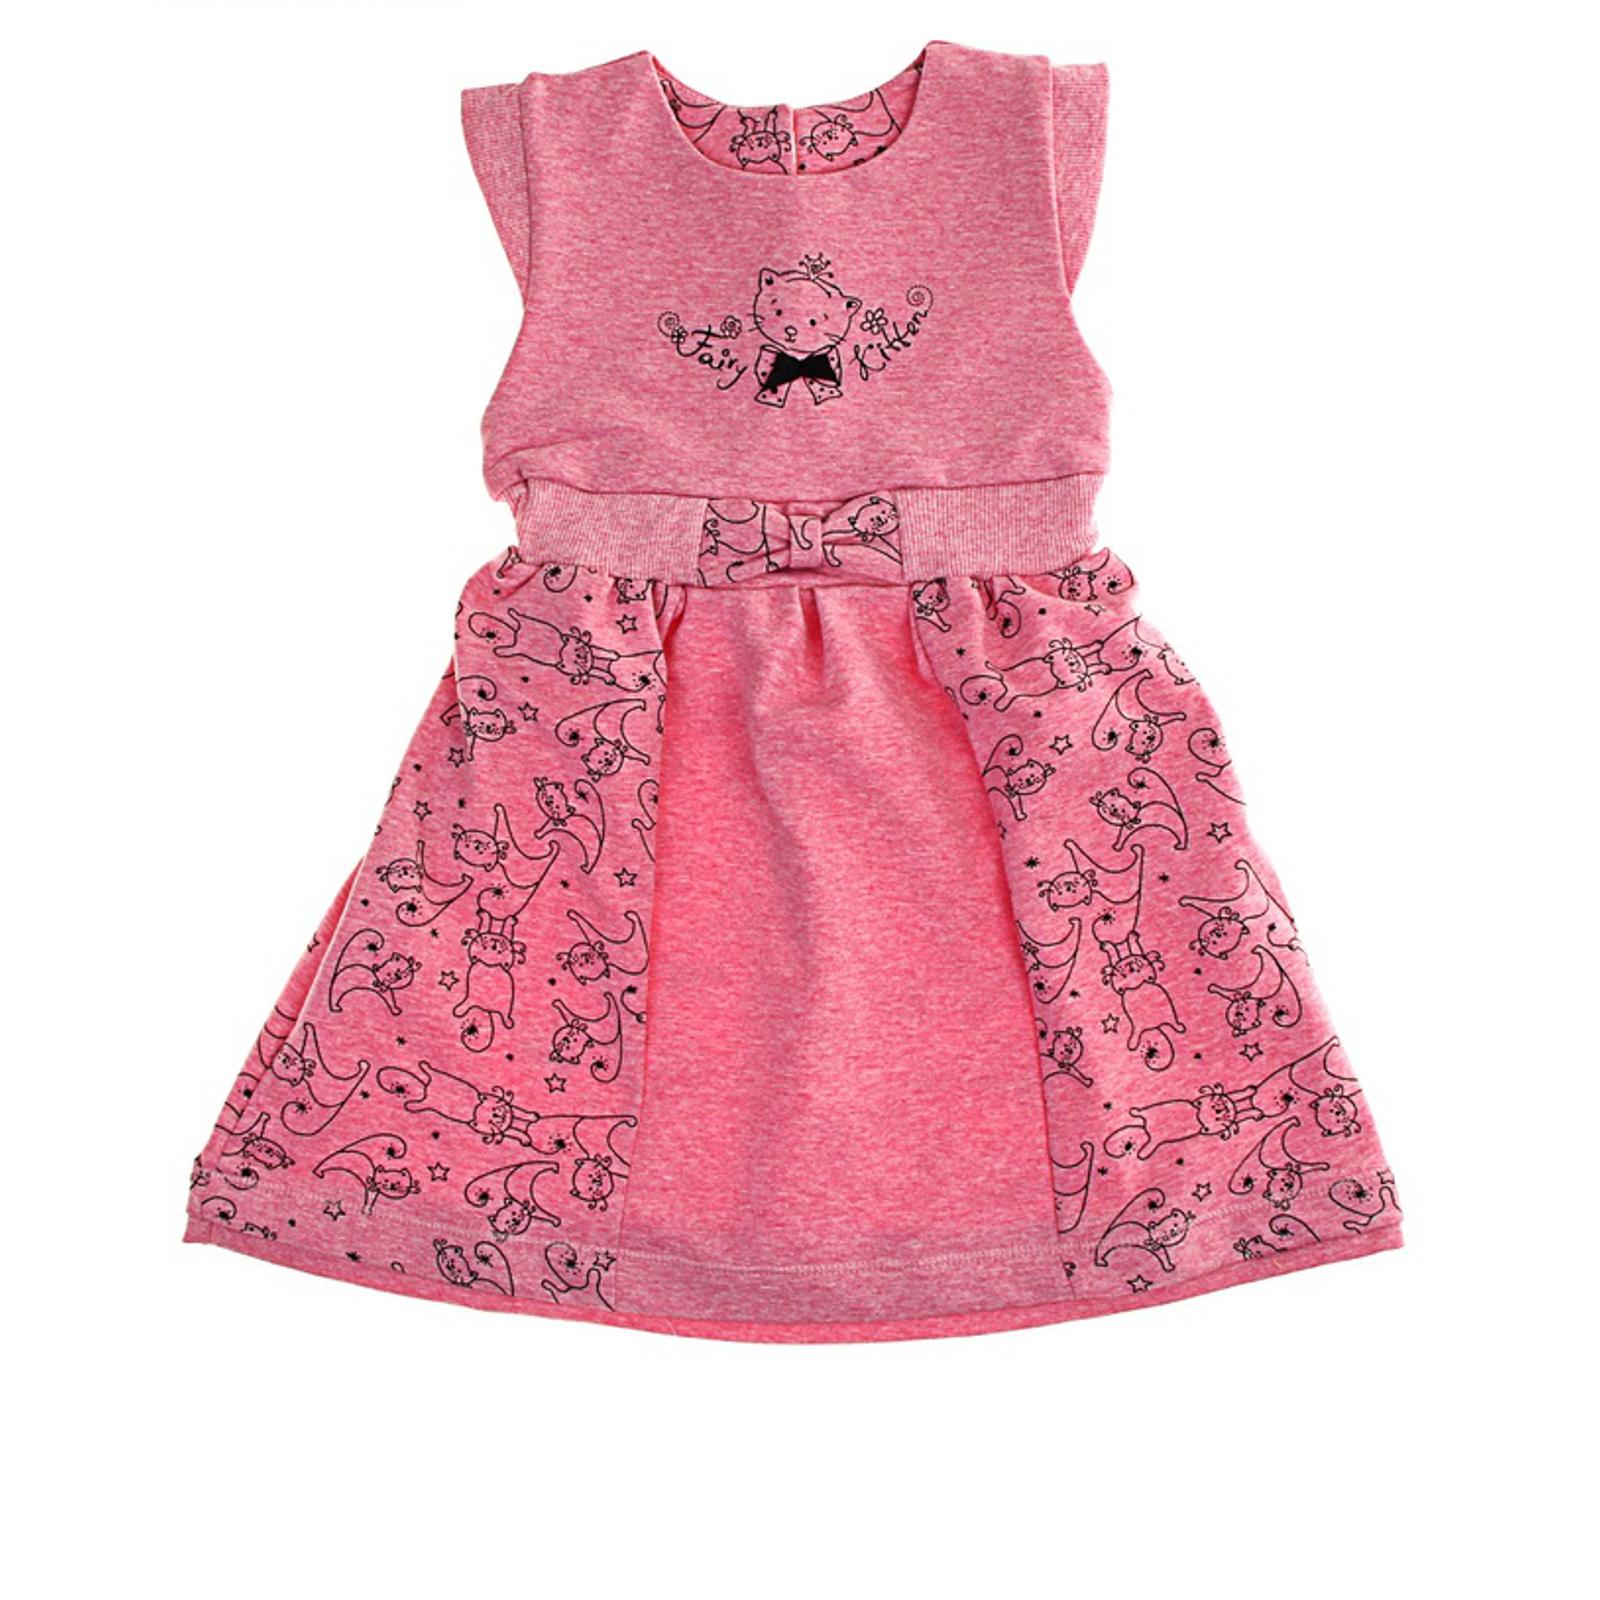 Сарафан Soni Kids Cони Кидс Кошечка Фея, цвет розовый размер 98